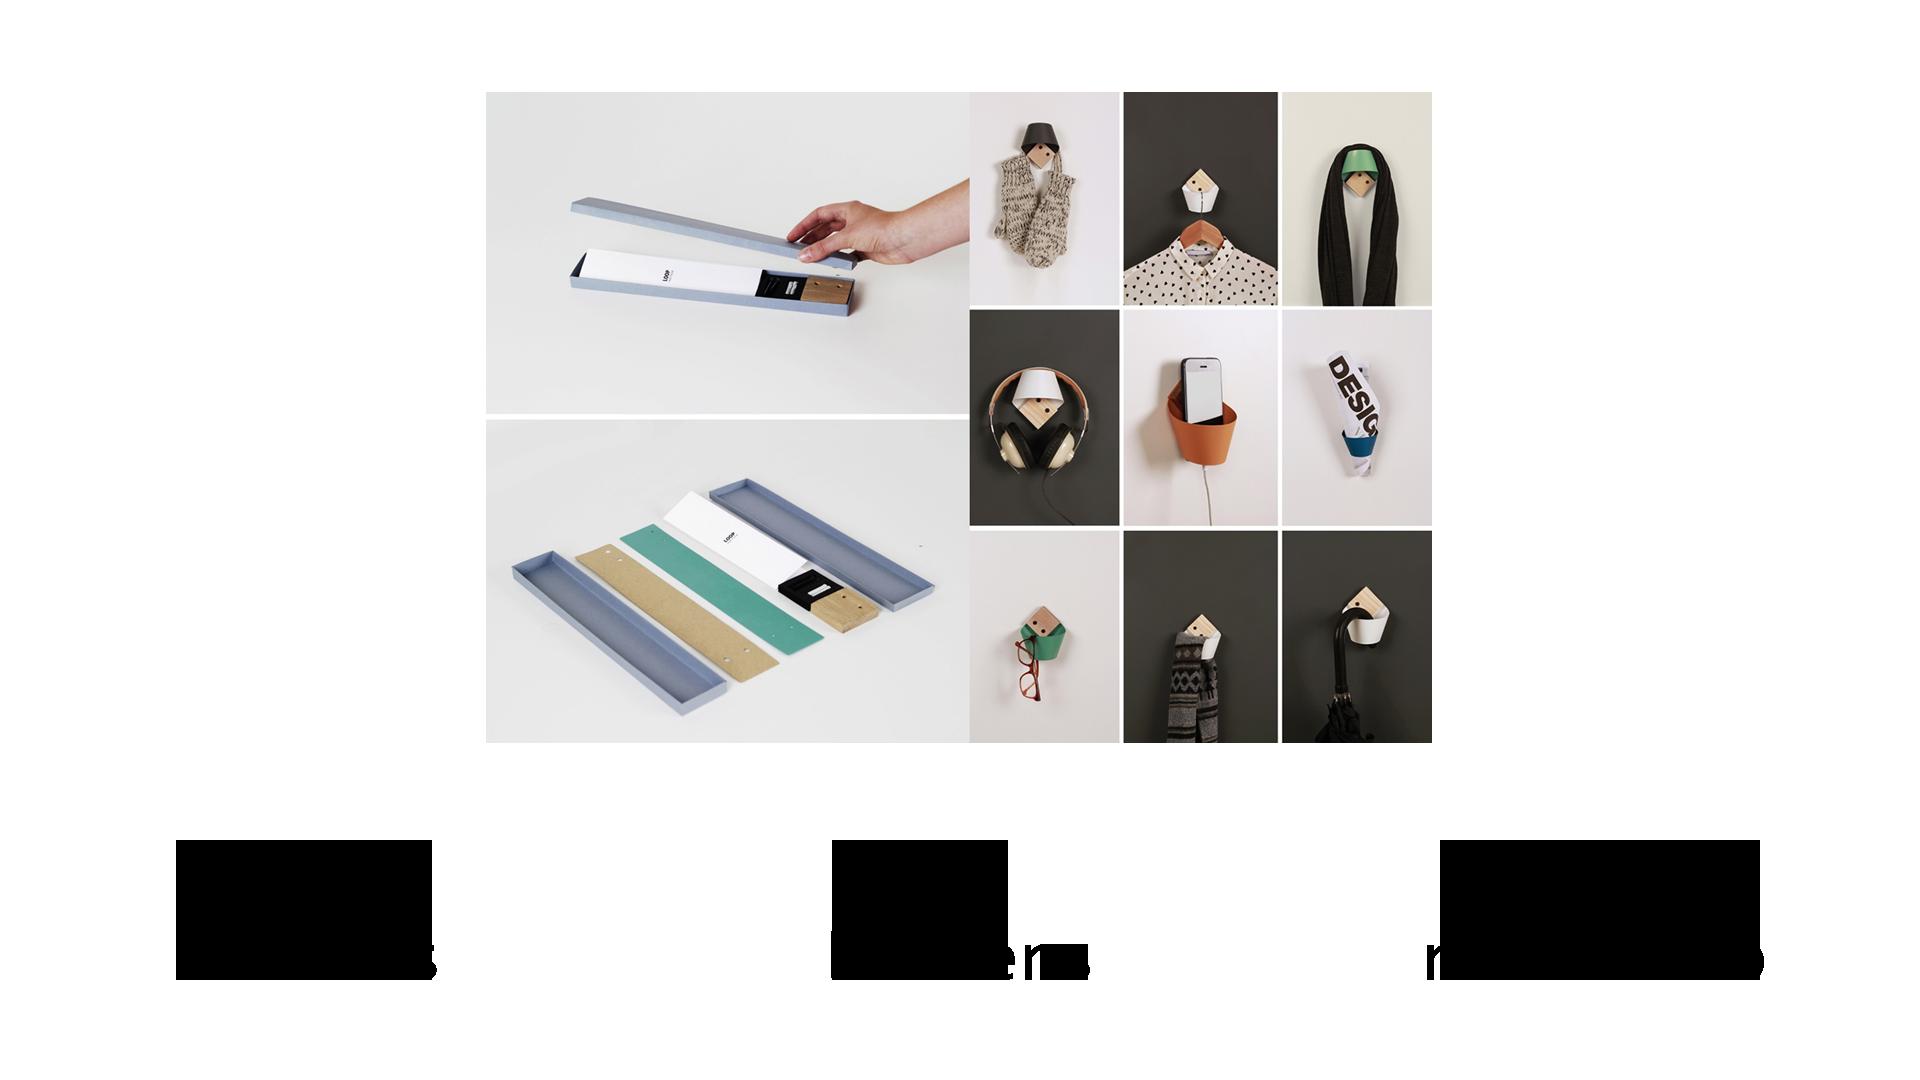 loop wall hook proyecto kickstarter laselva studio SYBIC crowdfunding